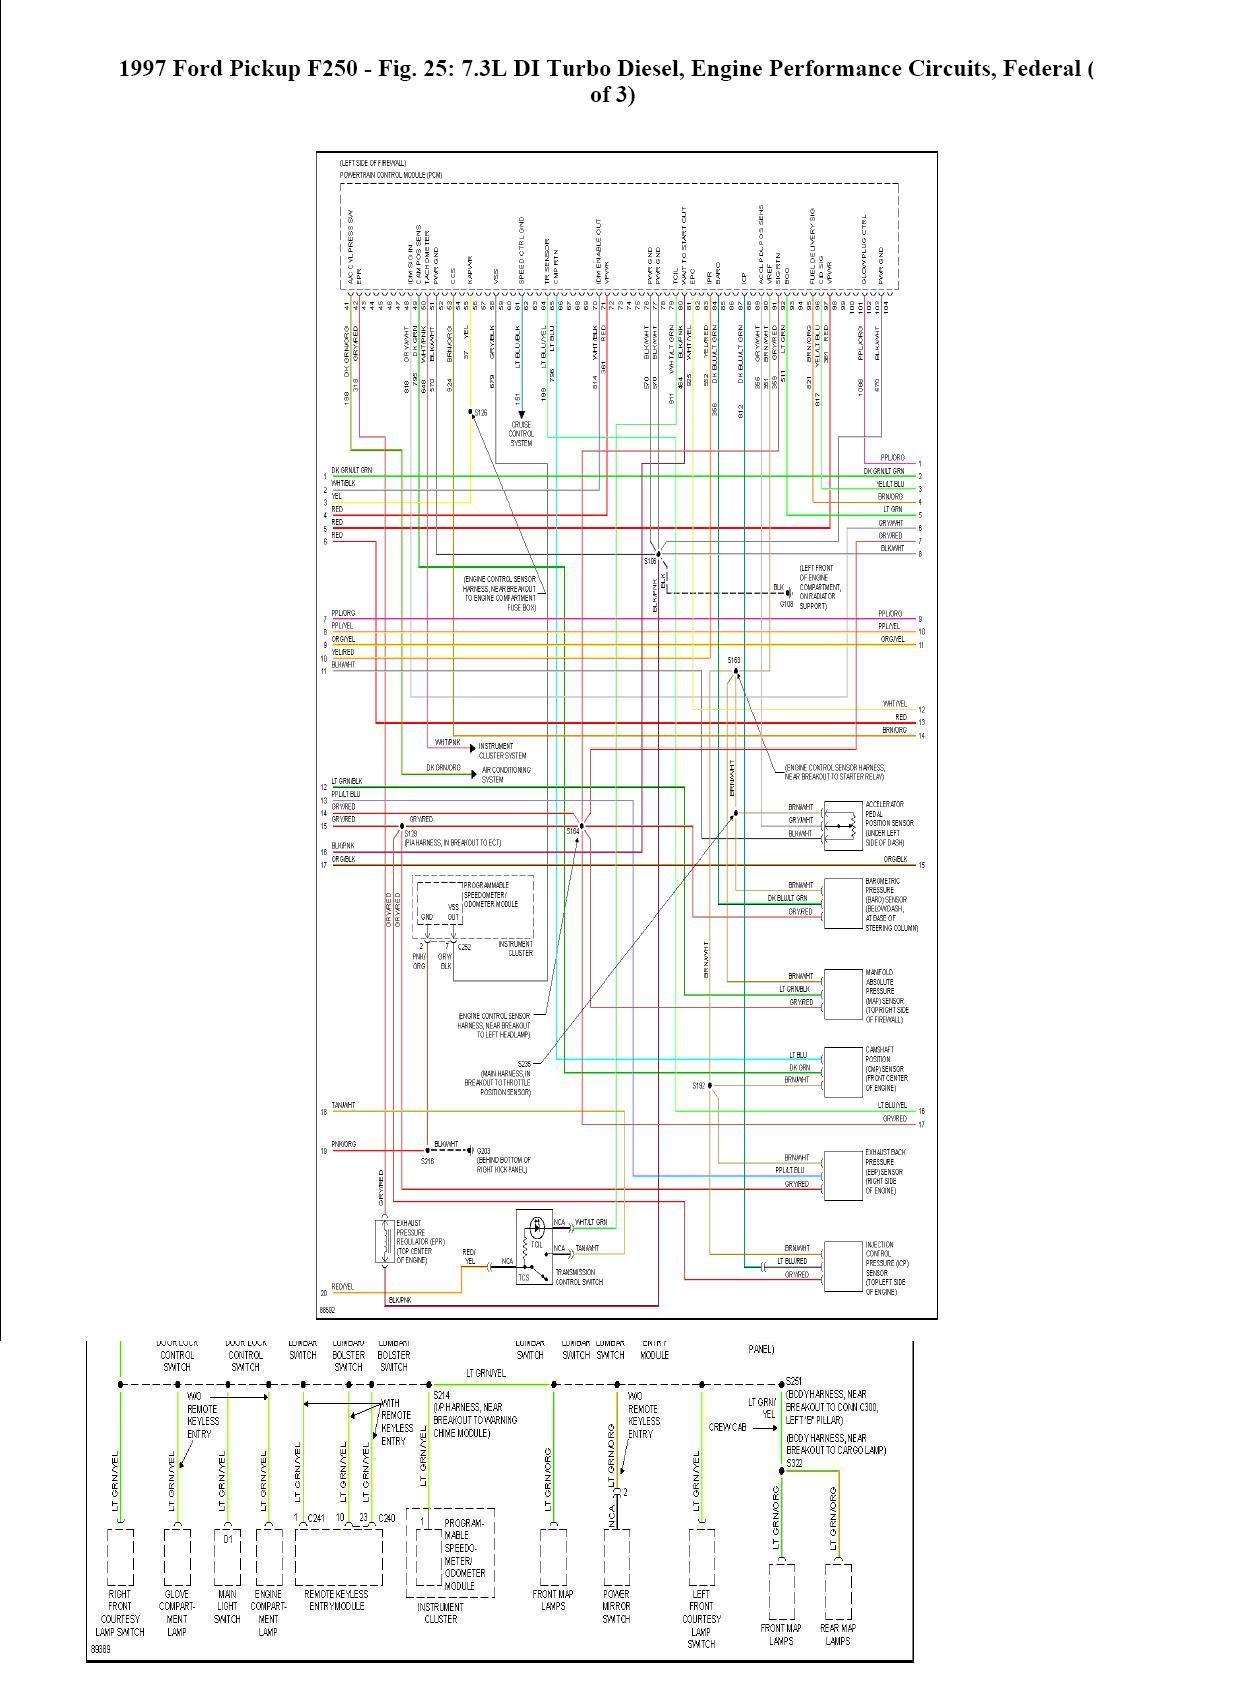 LE_2582] 97 F250 460 Wiring Diagram Free DiagramCajos Groa Mohammedshrine Librar Wiring 101